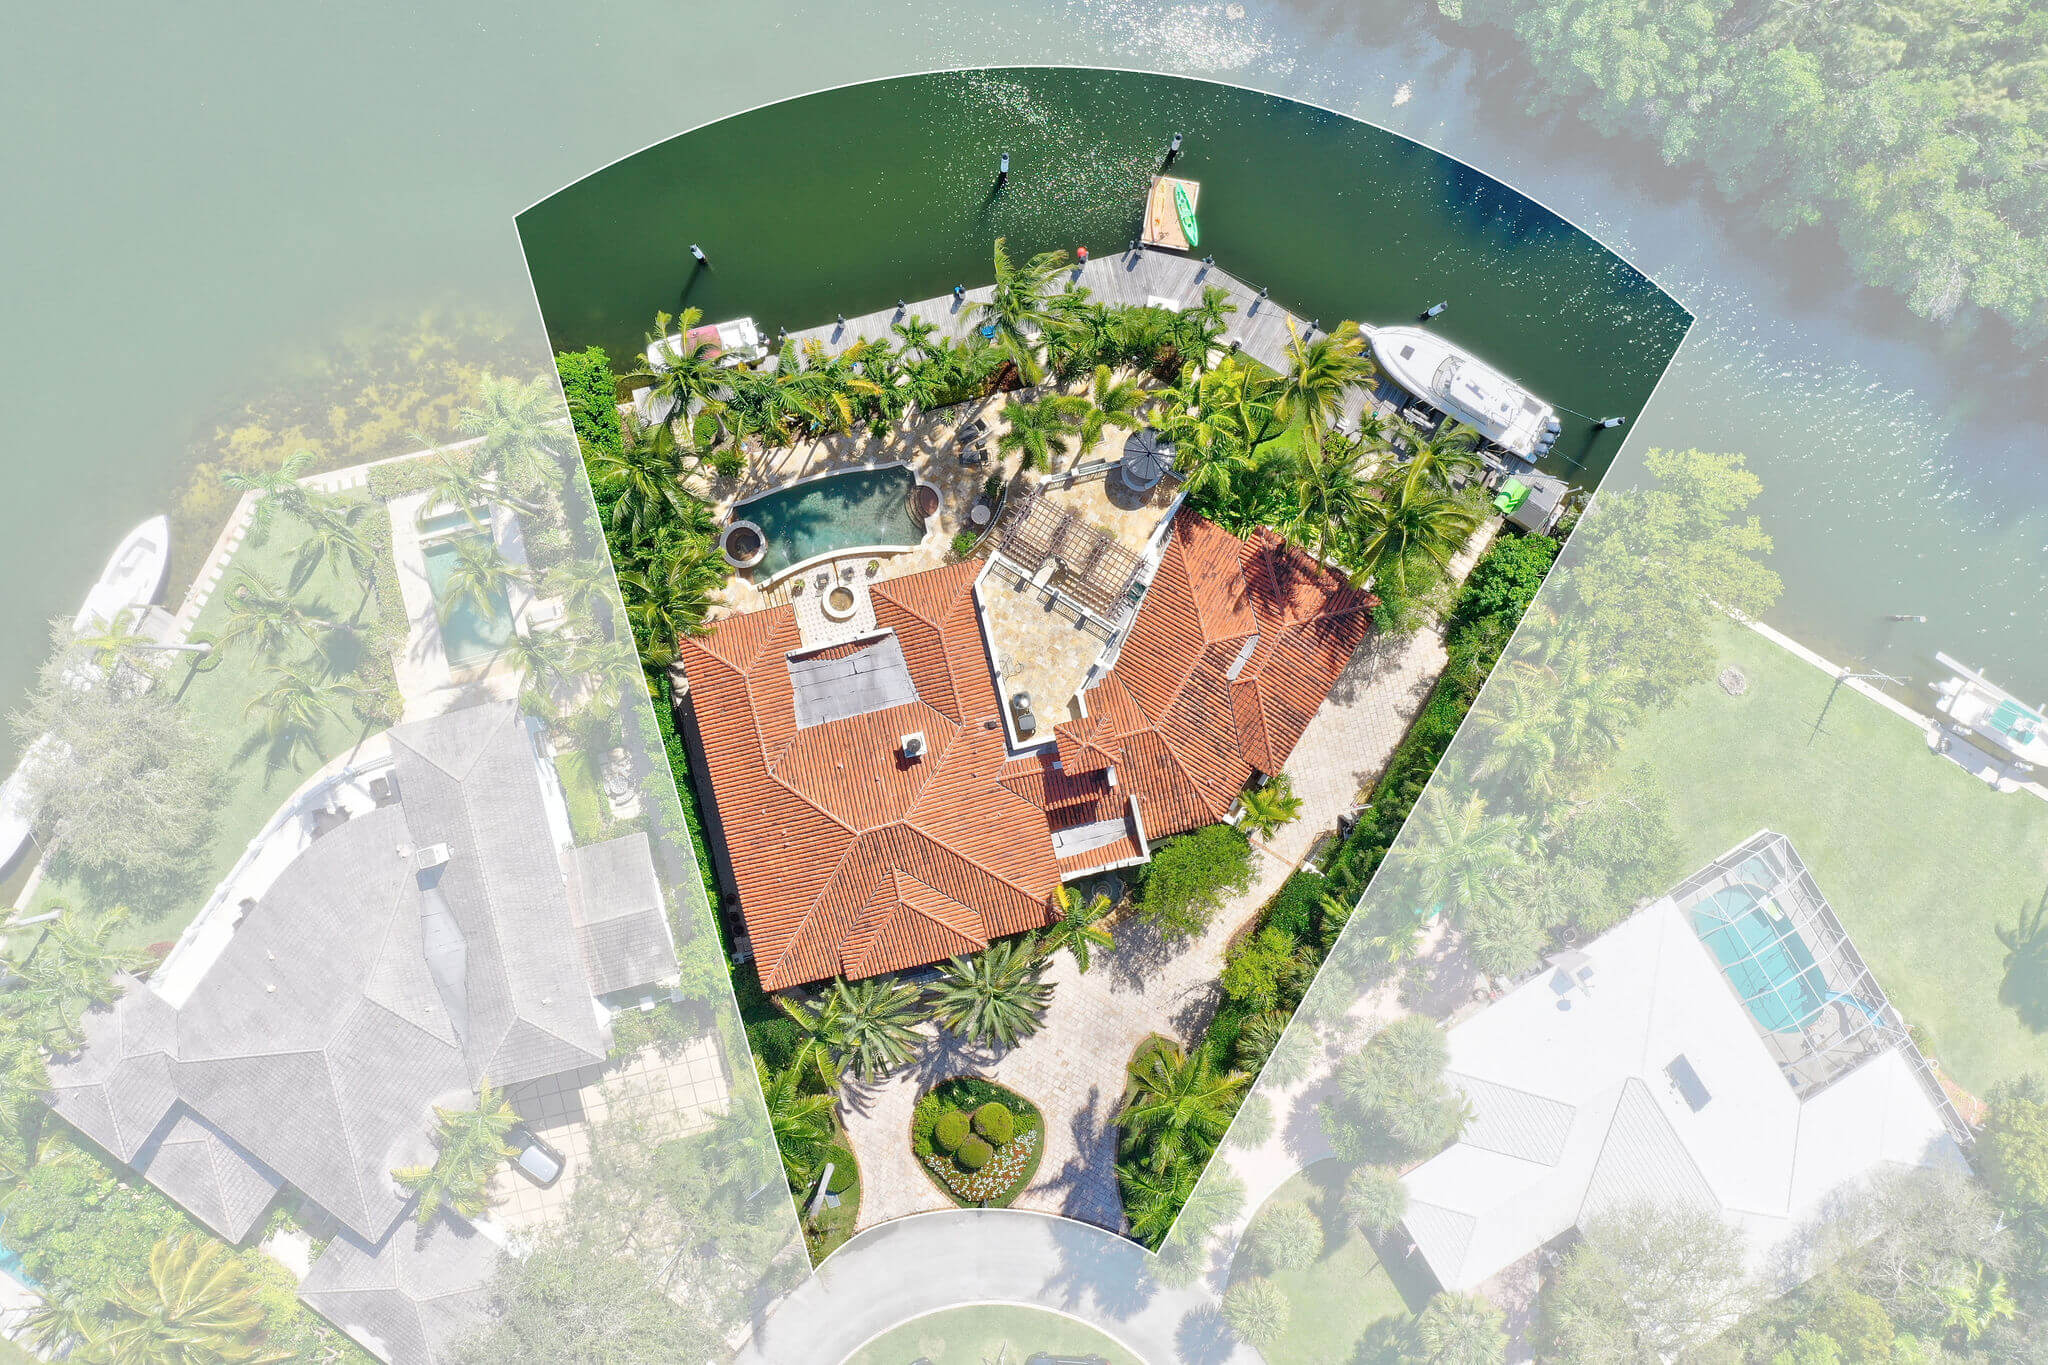 2_outline_photo_by_MiamiRealEstatePhotographers.com.jpg